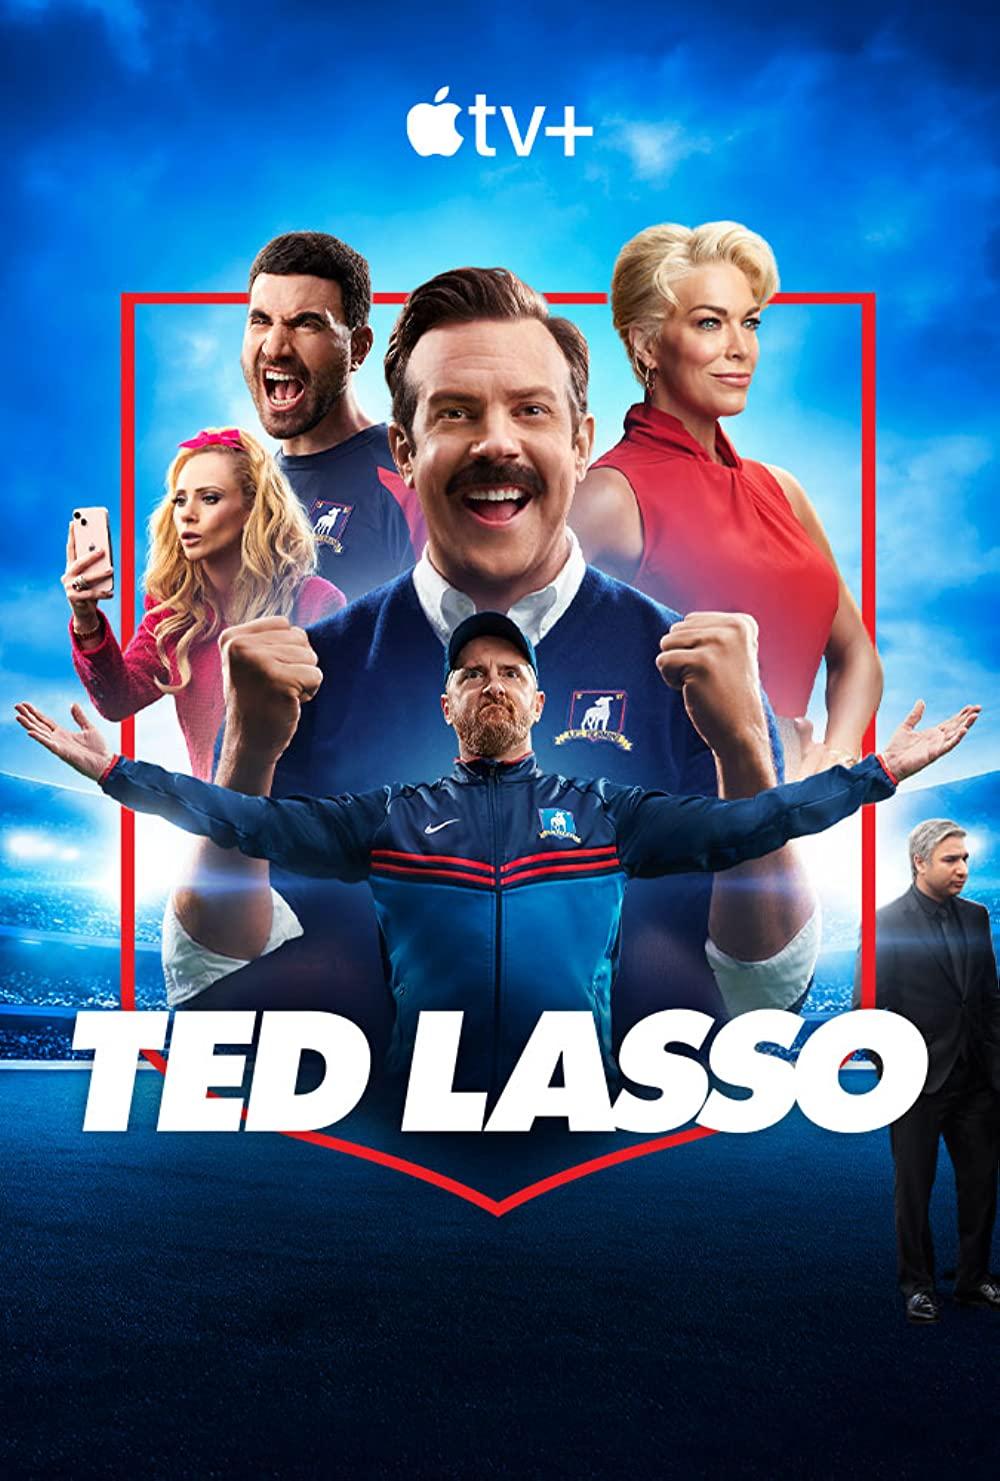 Ted Lasso kapak